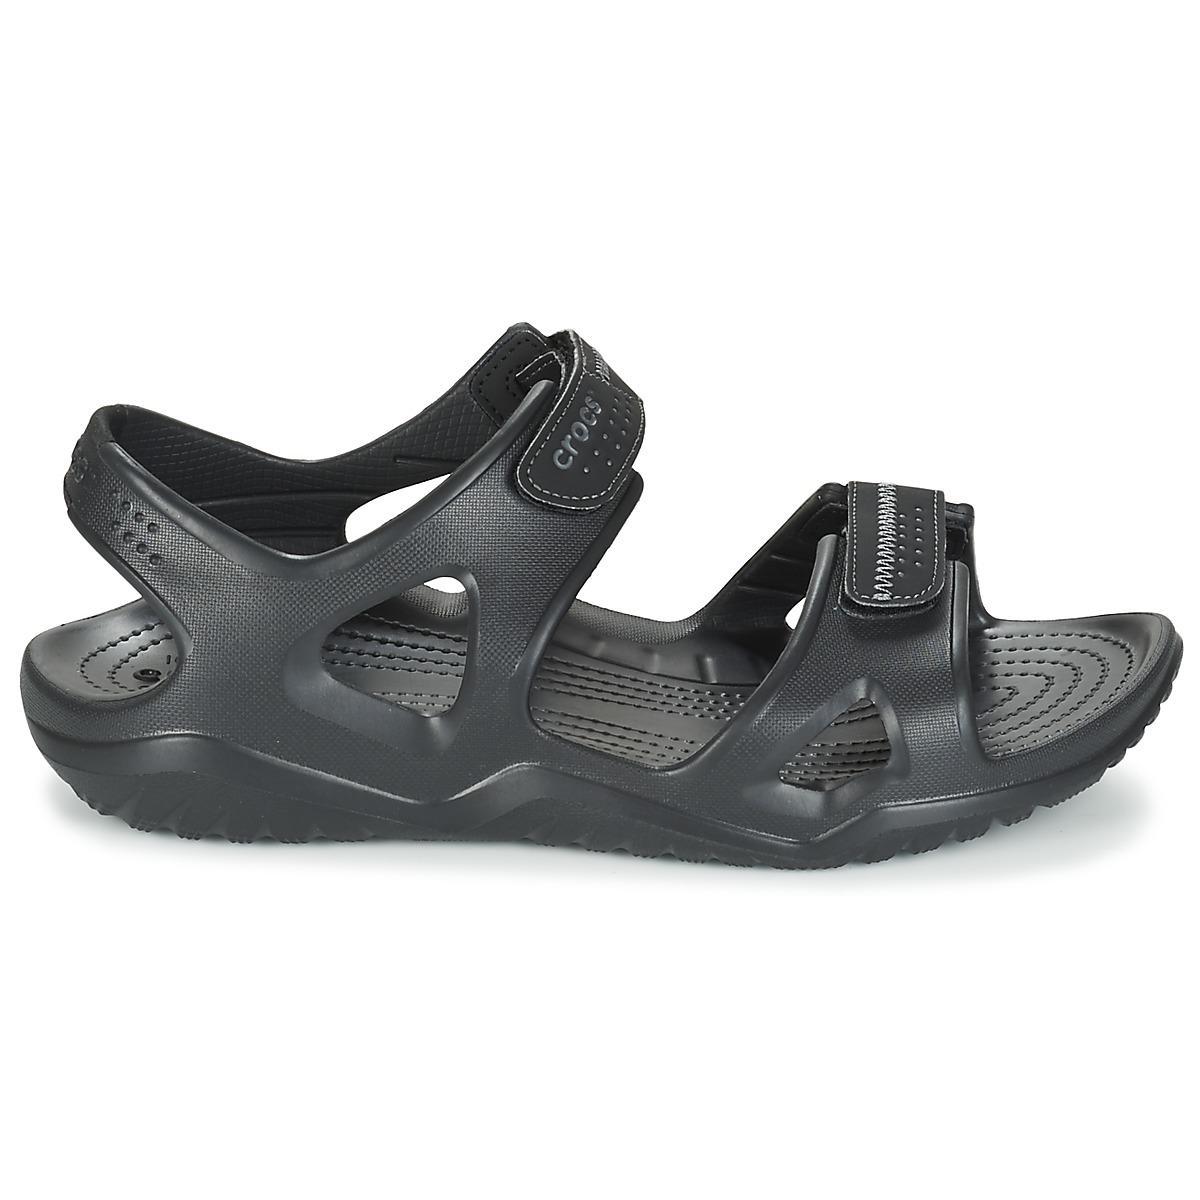 e25c19096c4 ... Black Swiftwater River Sandal Sandals for Men - Lyst. View fullscreen